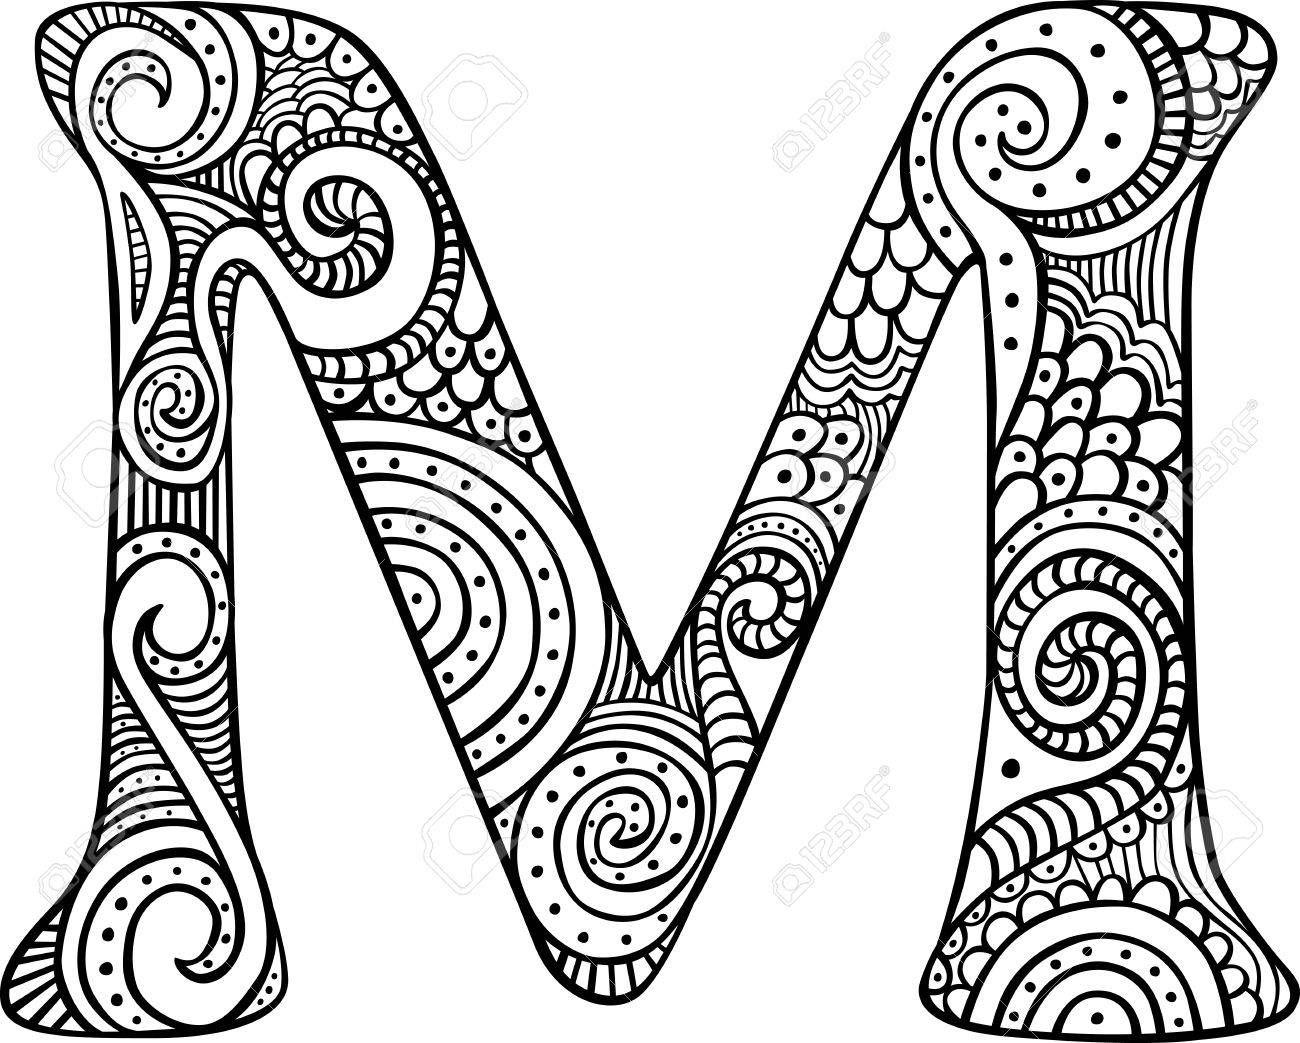 Mao Desenhada Letra Maiuscula M Em Preto Folha De Coloracao Para Adultos Colouring Sheets For Adults Mandala Coloring Pages Coloring Letters